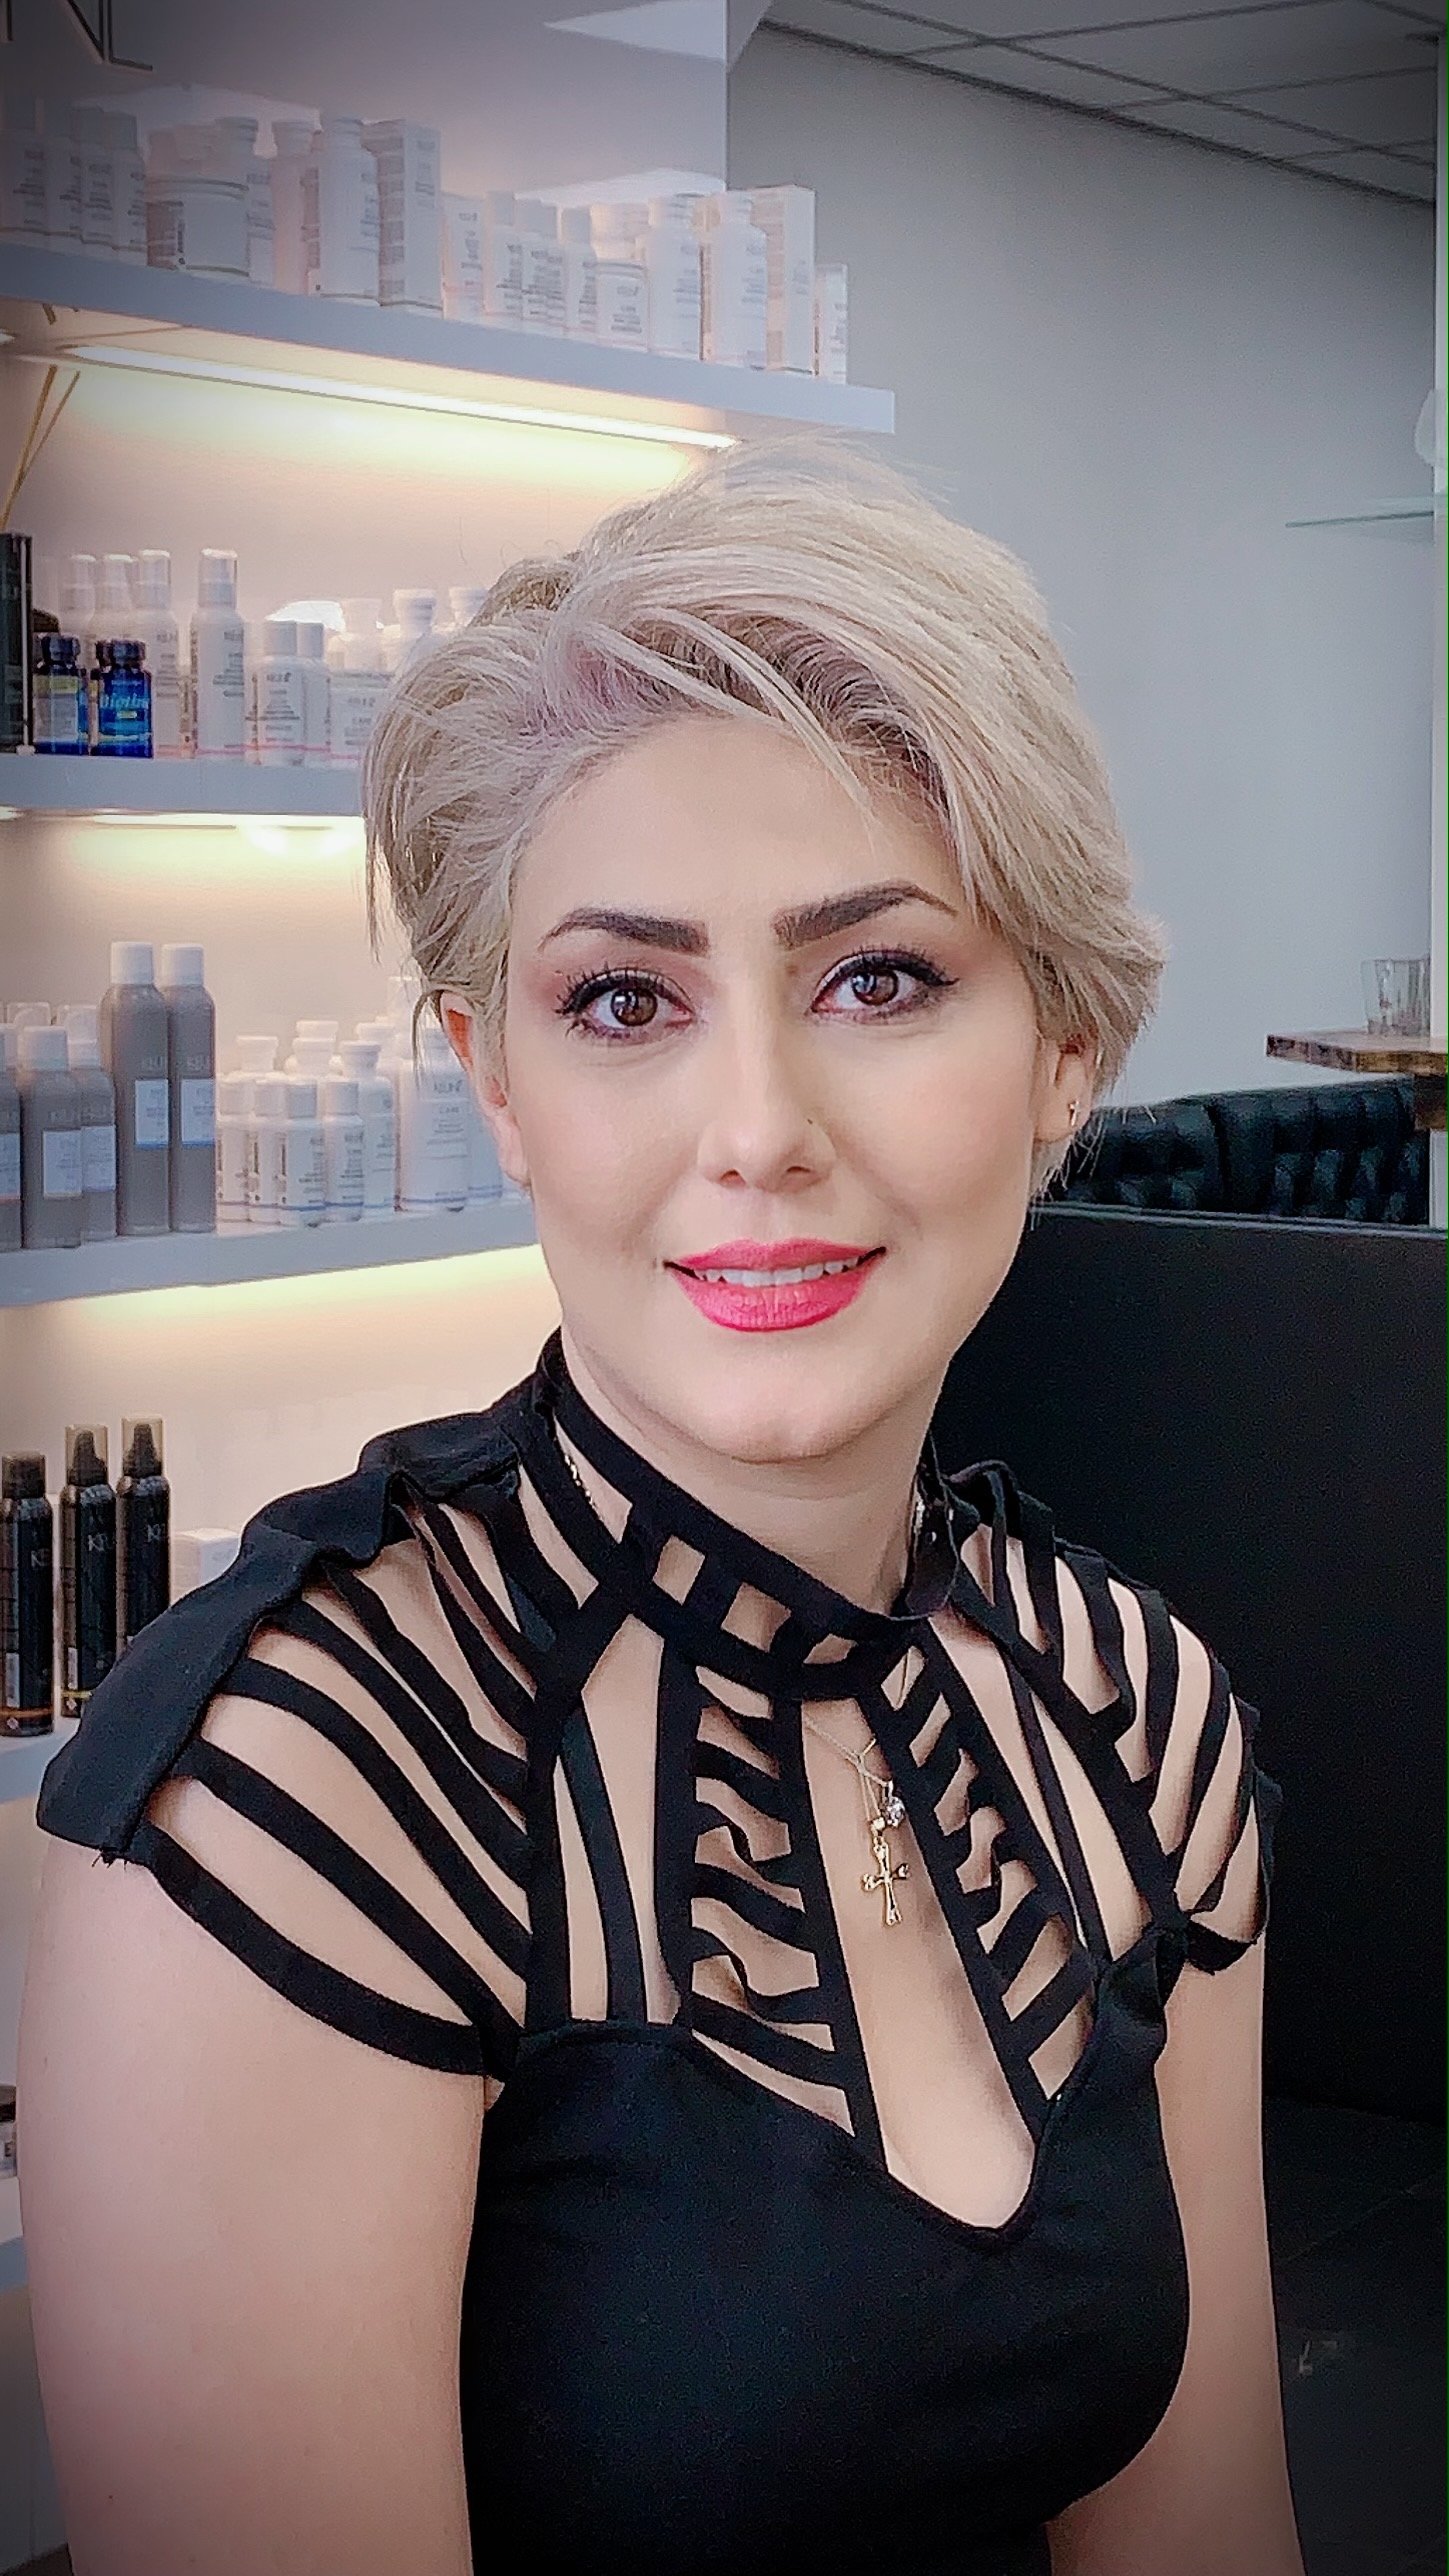 Sam - Kapper bij Beauty & Hairstyling YORD Utrecht